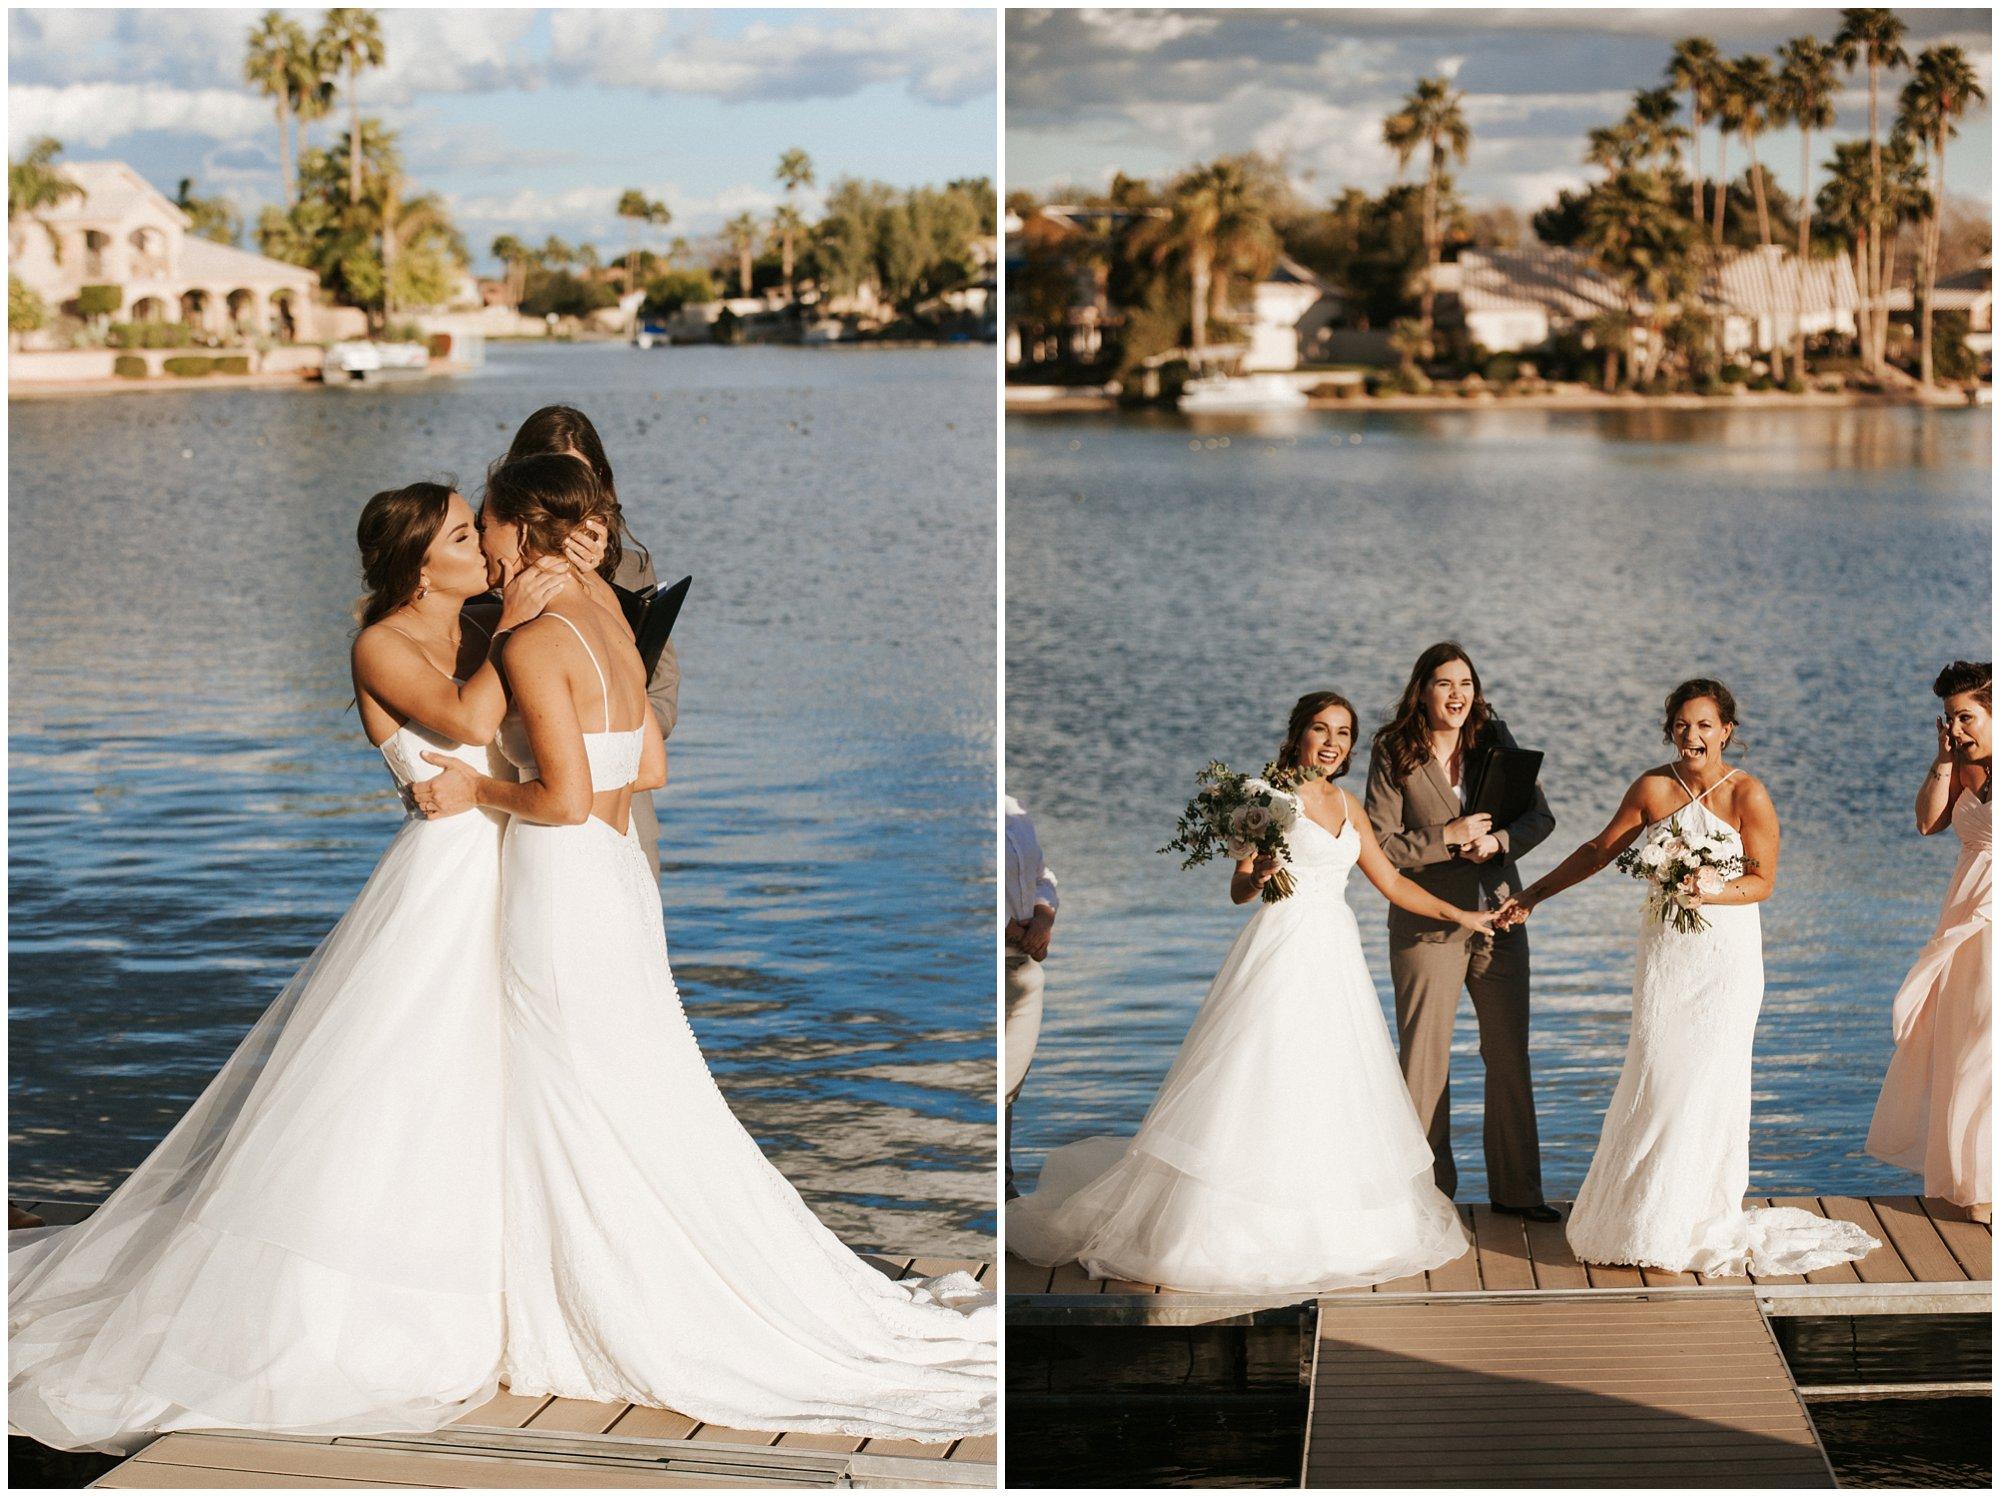 arizona same sex wedding photographer - jenni and lauren wedding the islands clubhouse_0069.jpg